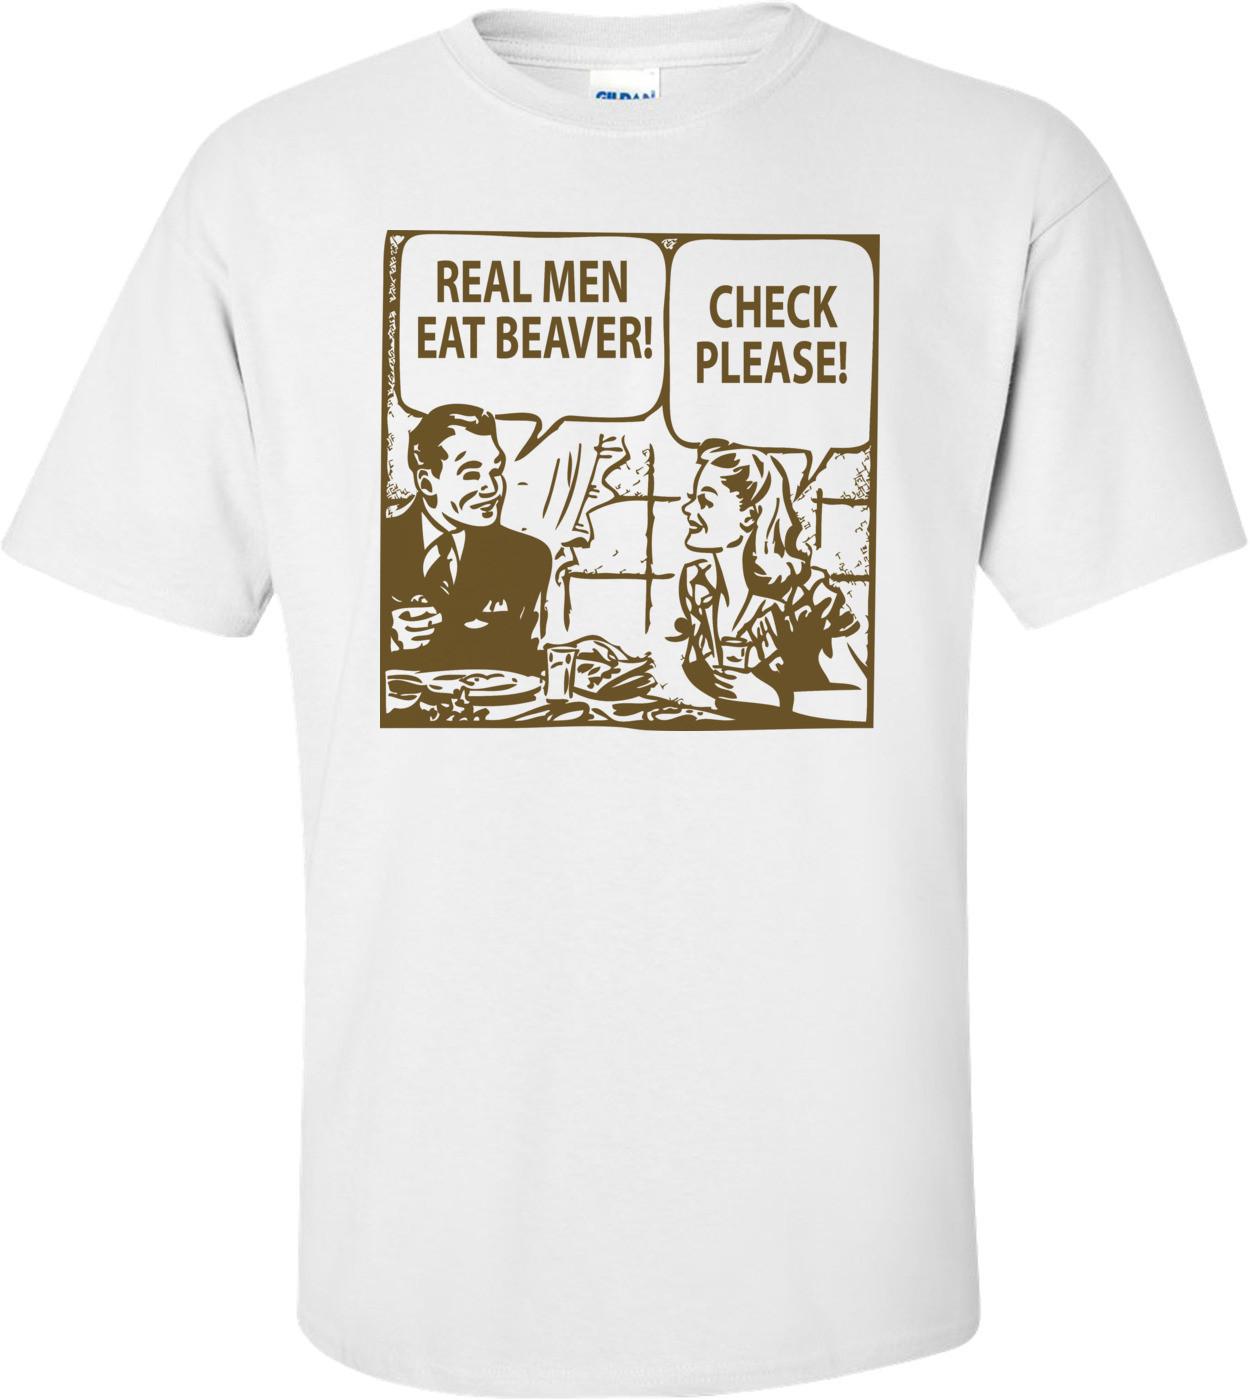 Real Men Eat Beaver T-shirt